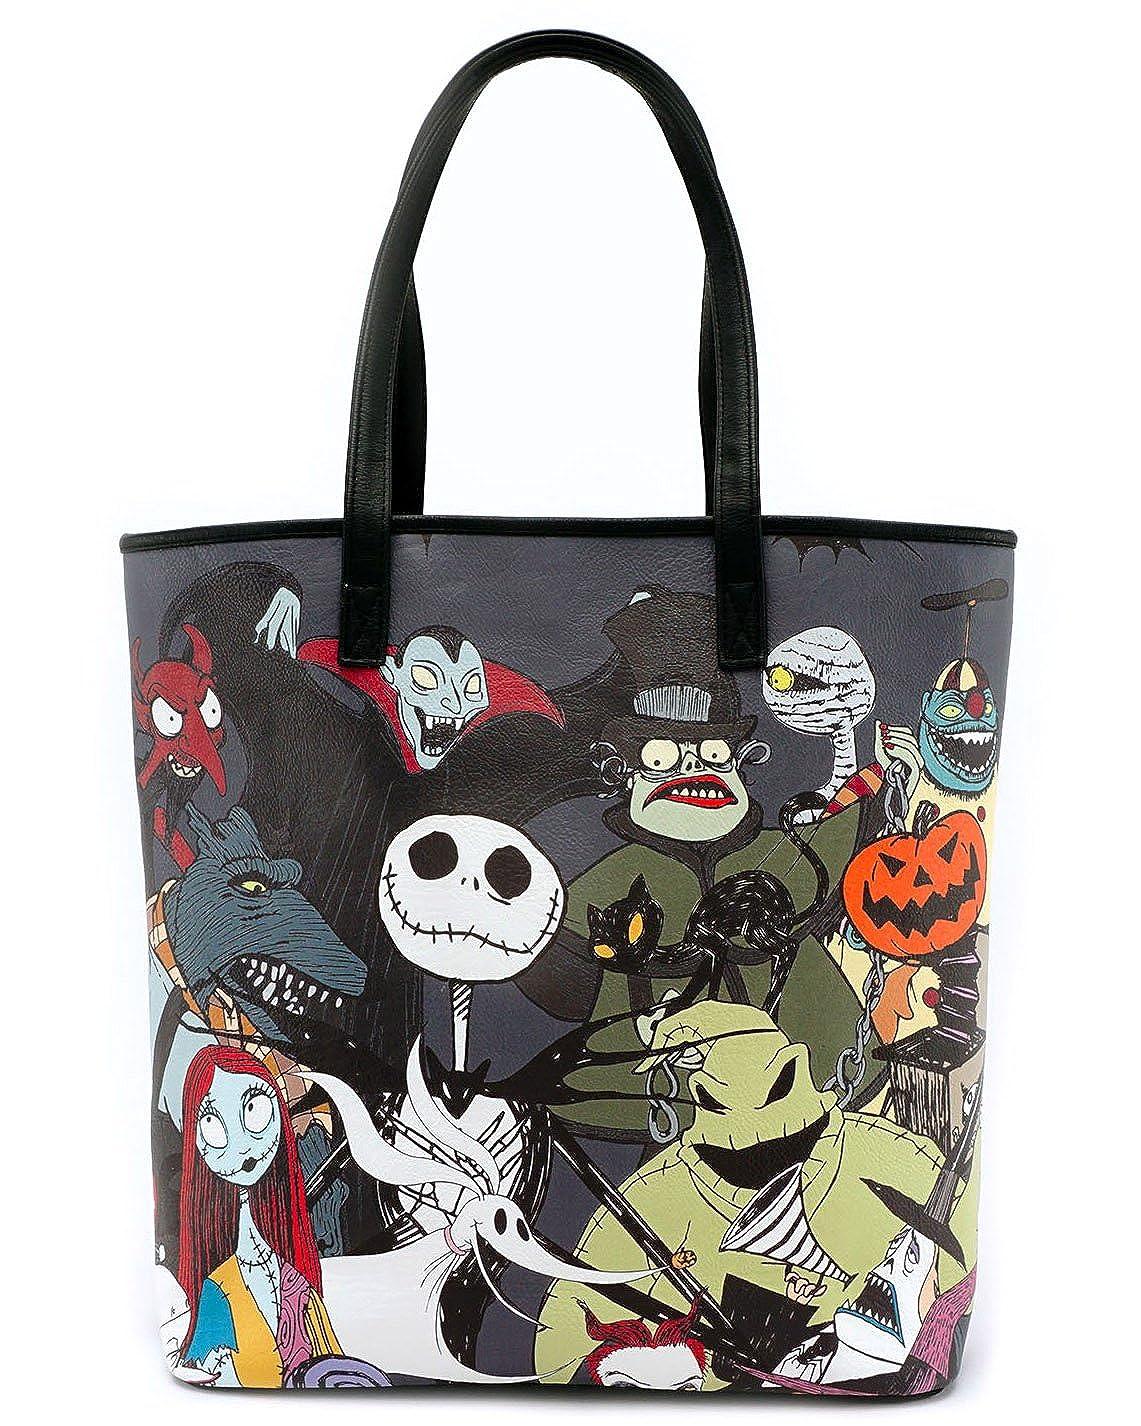 Nightmare Before Christmas Purses Handbags.Loungefly X Nightmare Before Christmas Character Print Tote Purse